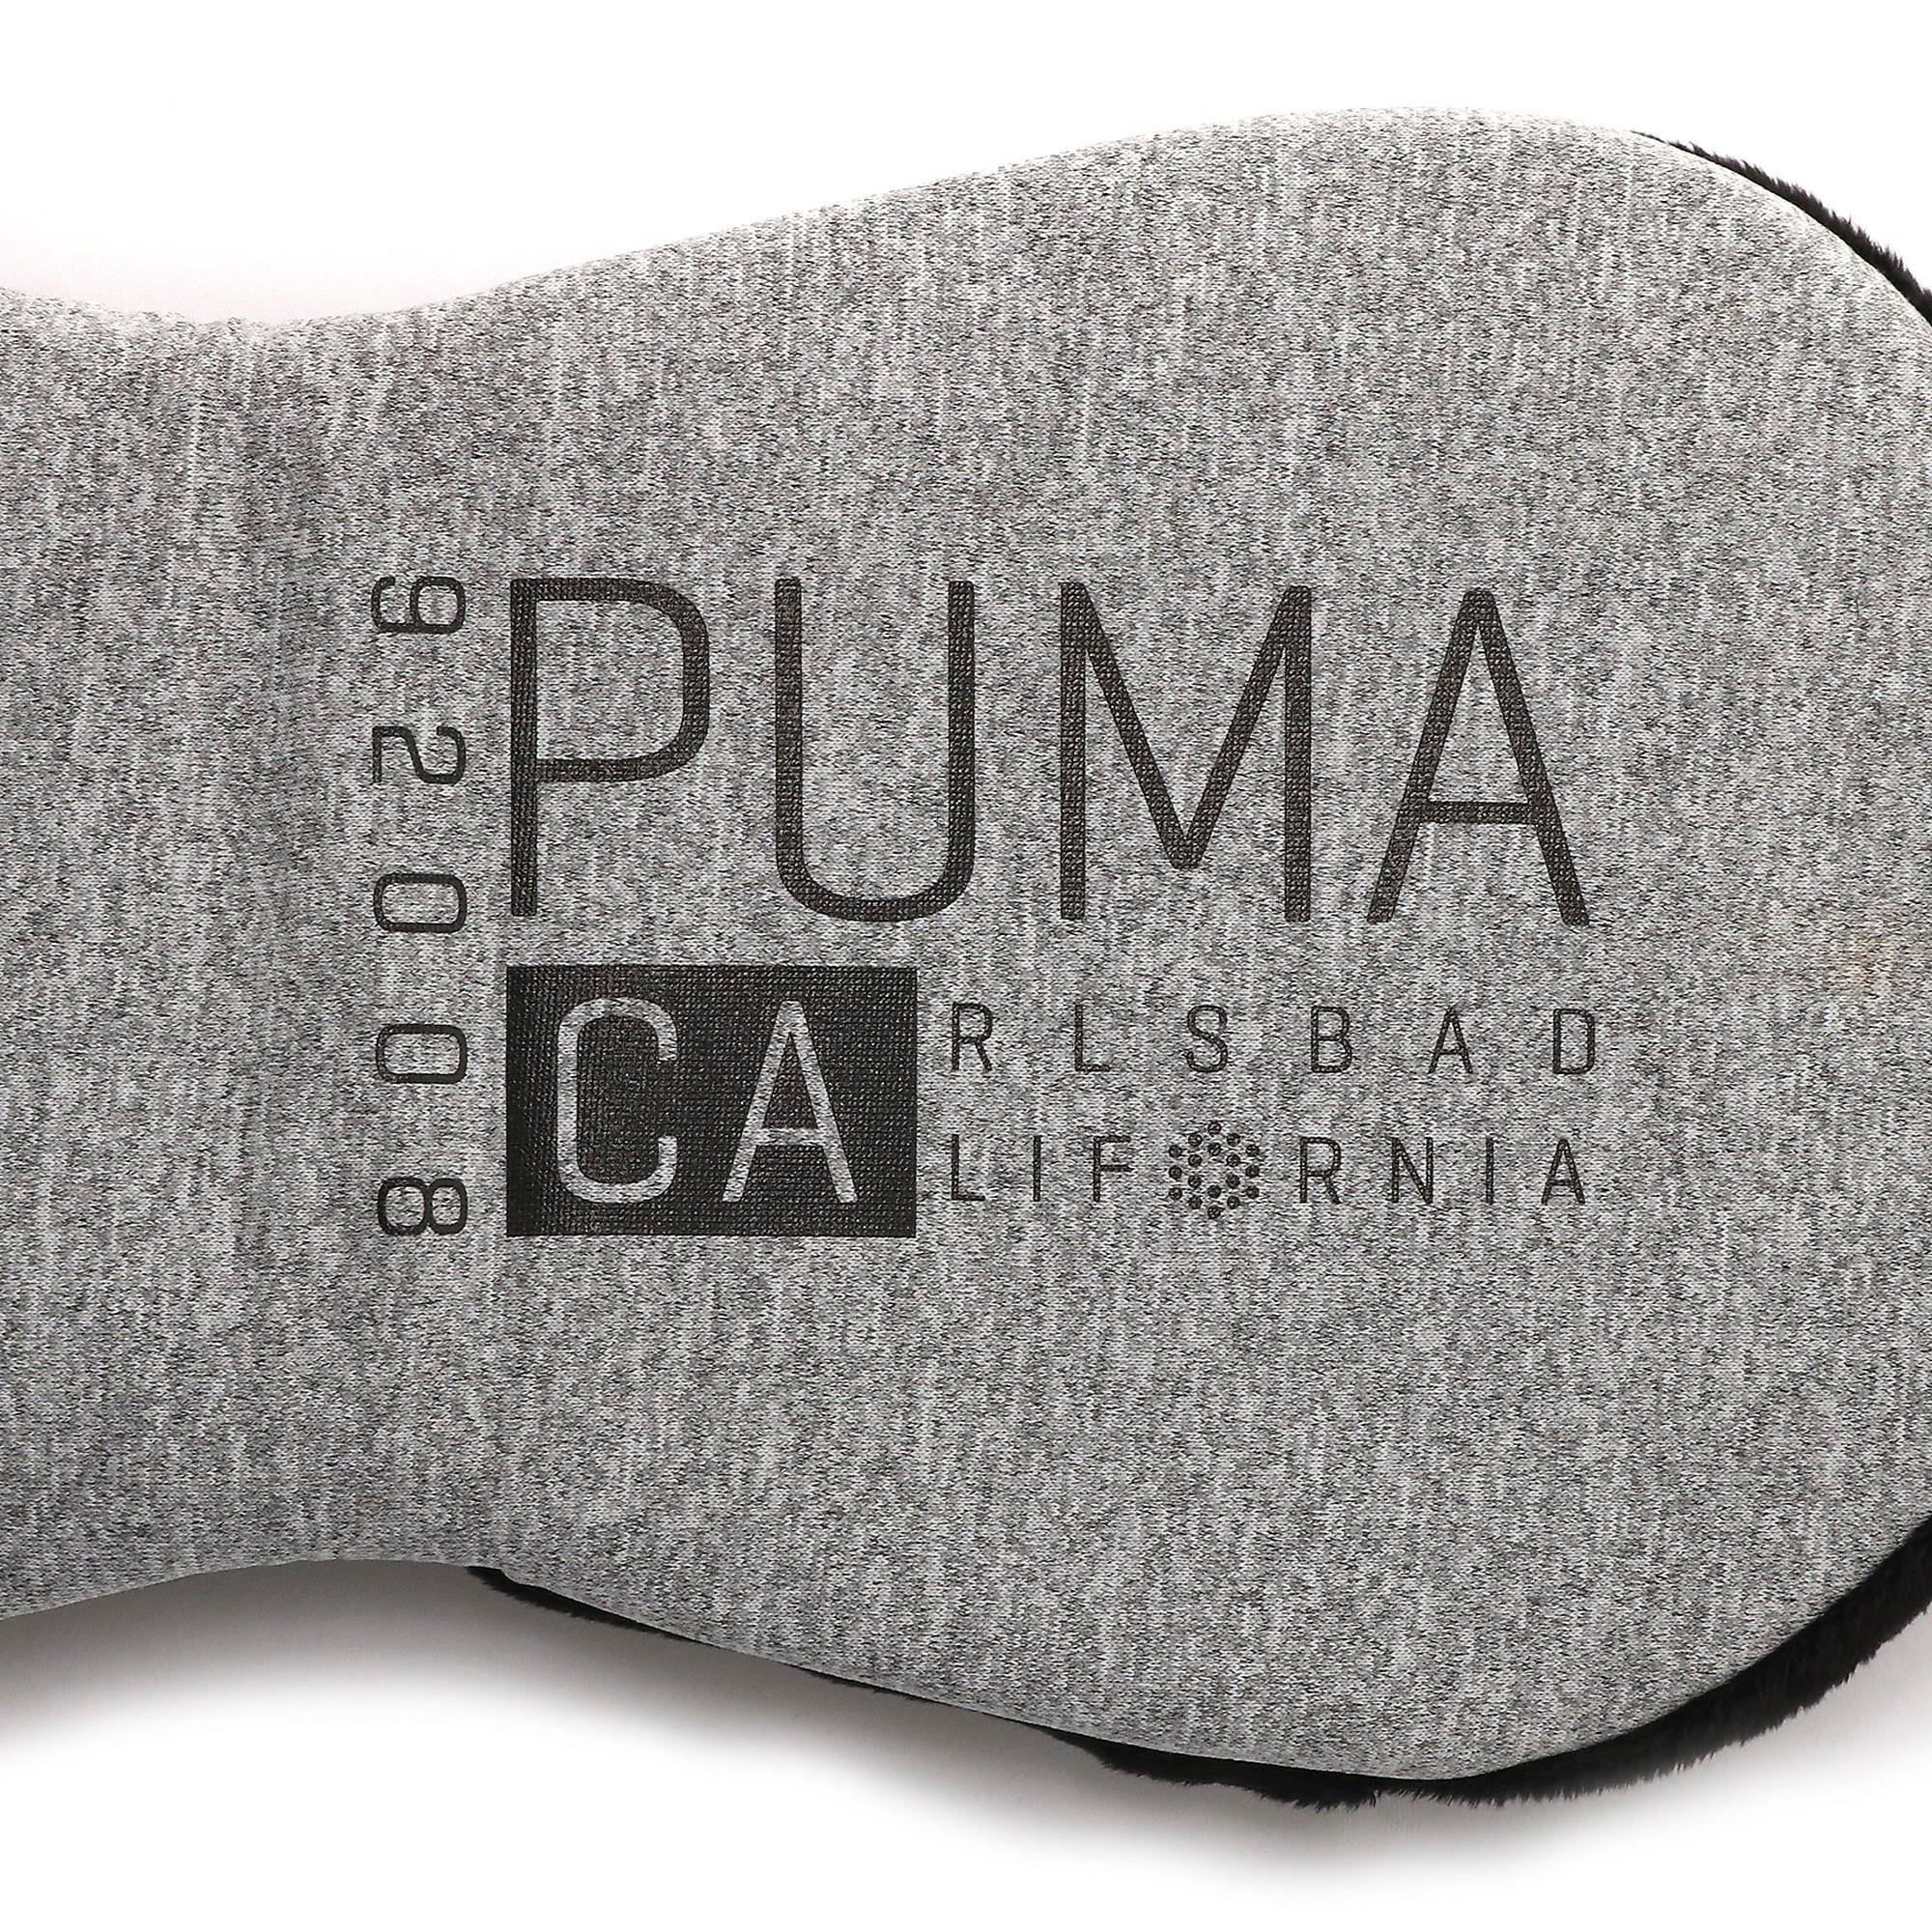 Thumbnail 4 of ゴルフ CA ヘッドカバー ドライバー, light gray heather, medium-JPN